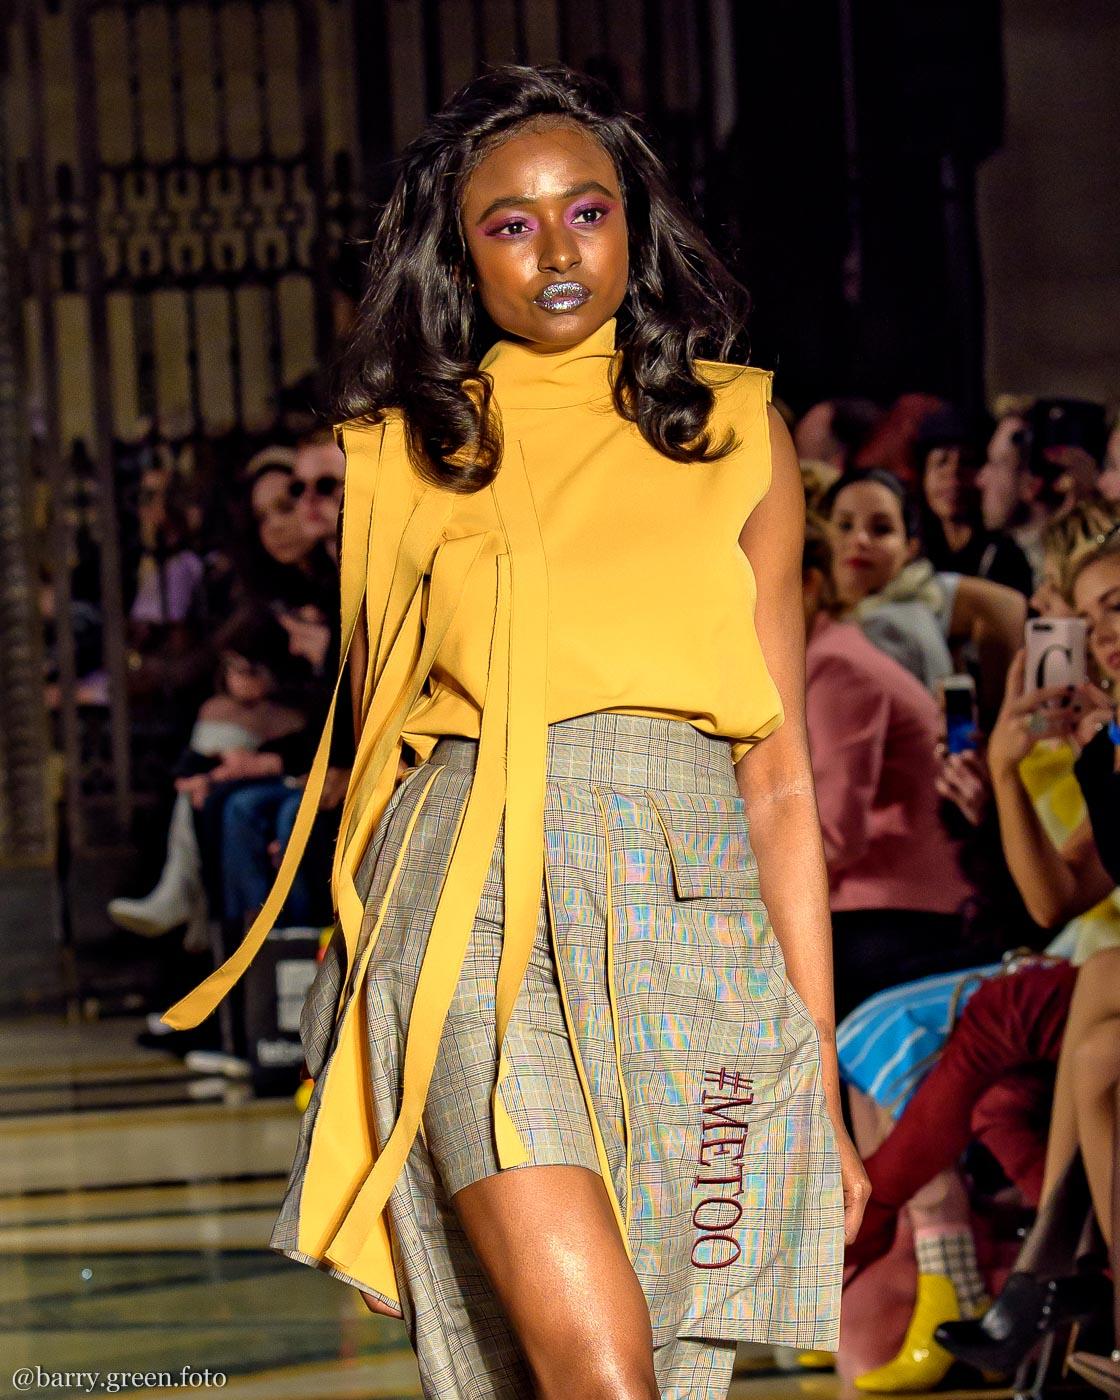 London Fashion Week AW18 catwalk collection by designer DeebyDalia from Dubai Design & Fashion Council DDFC